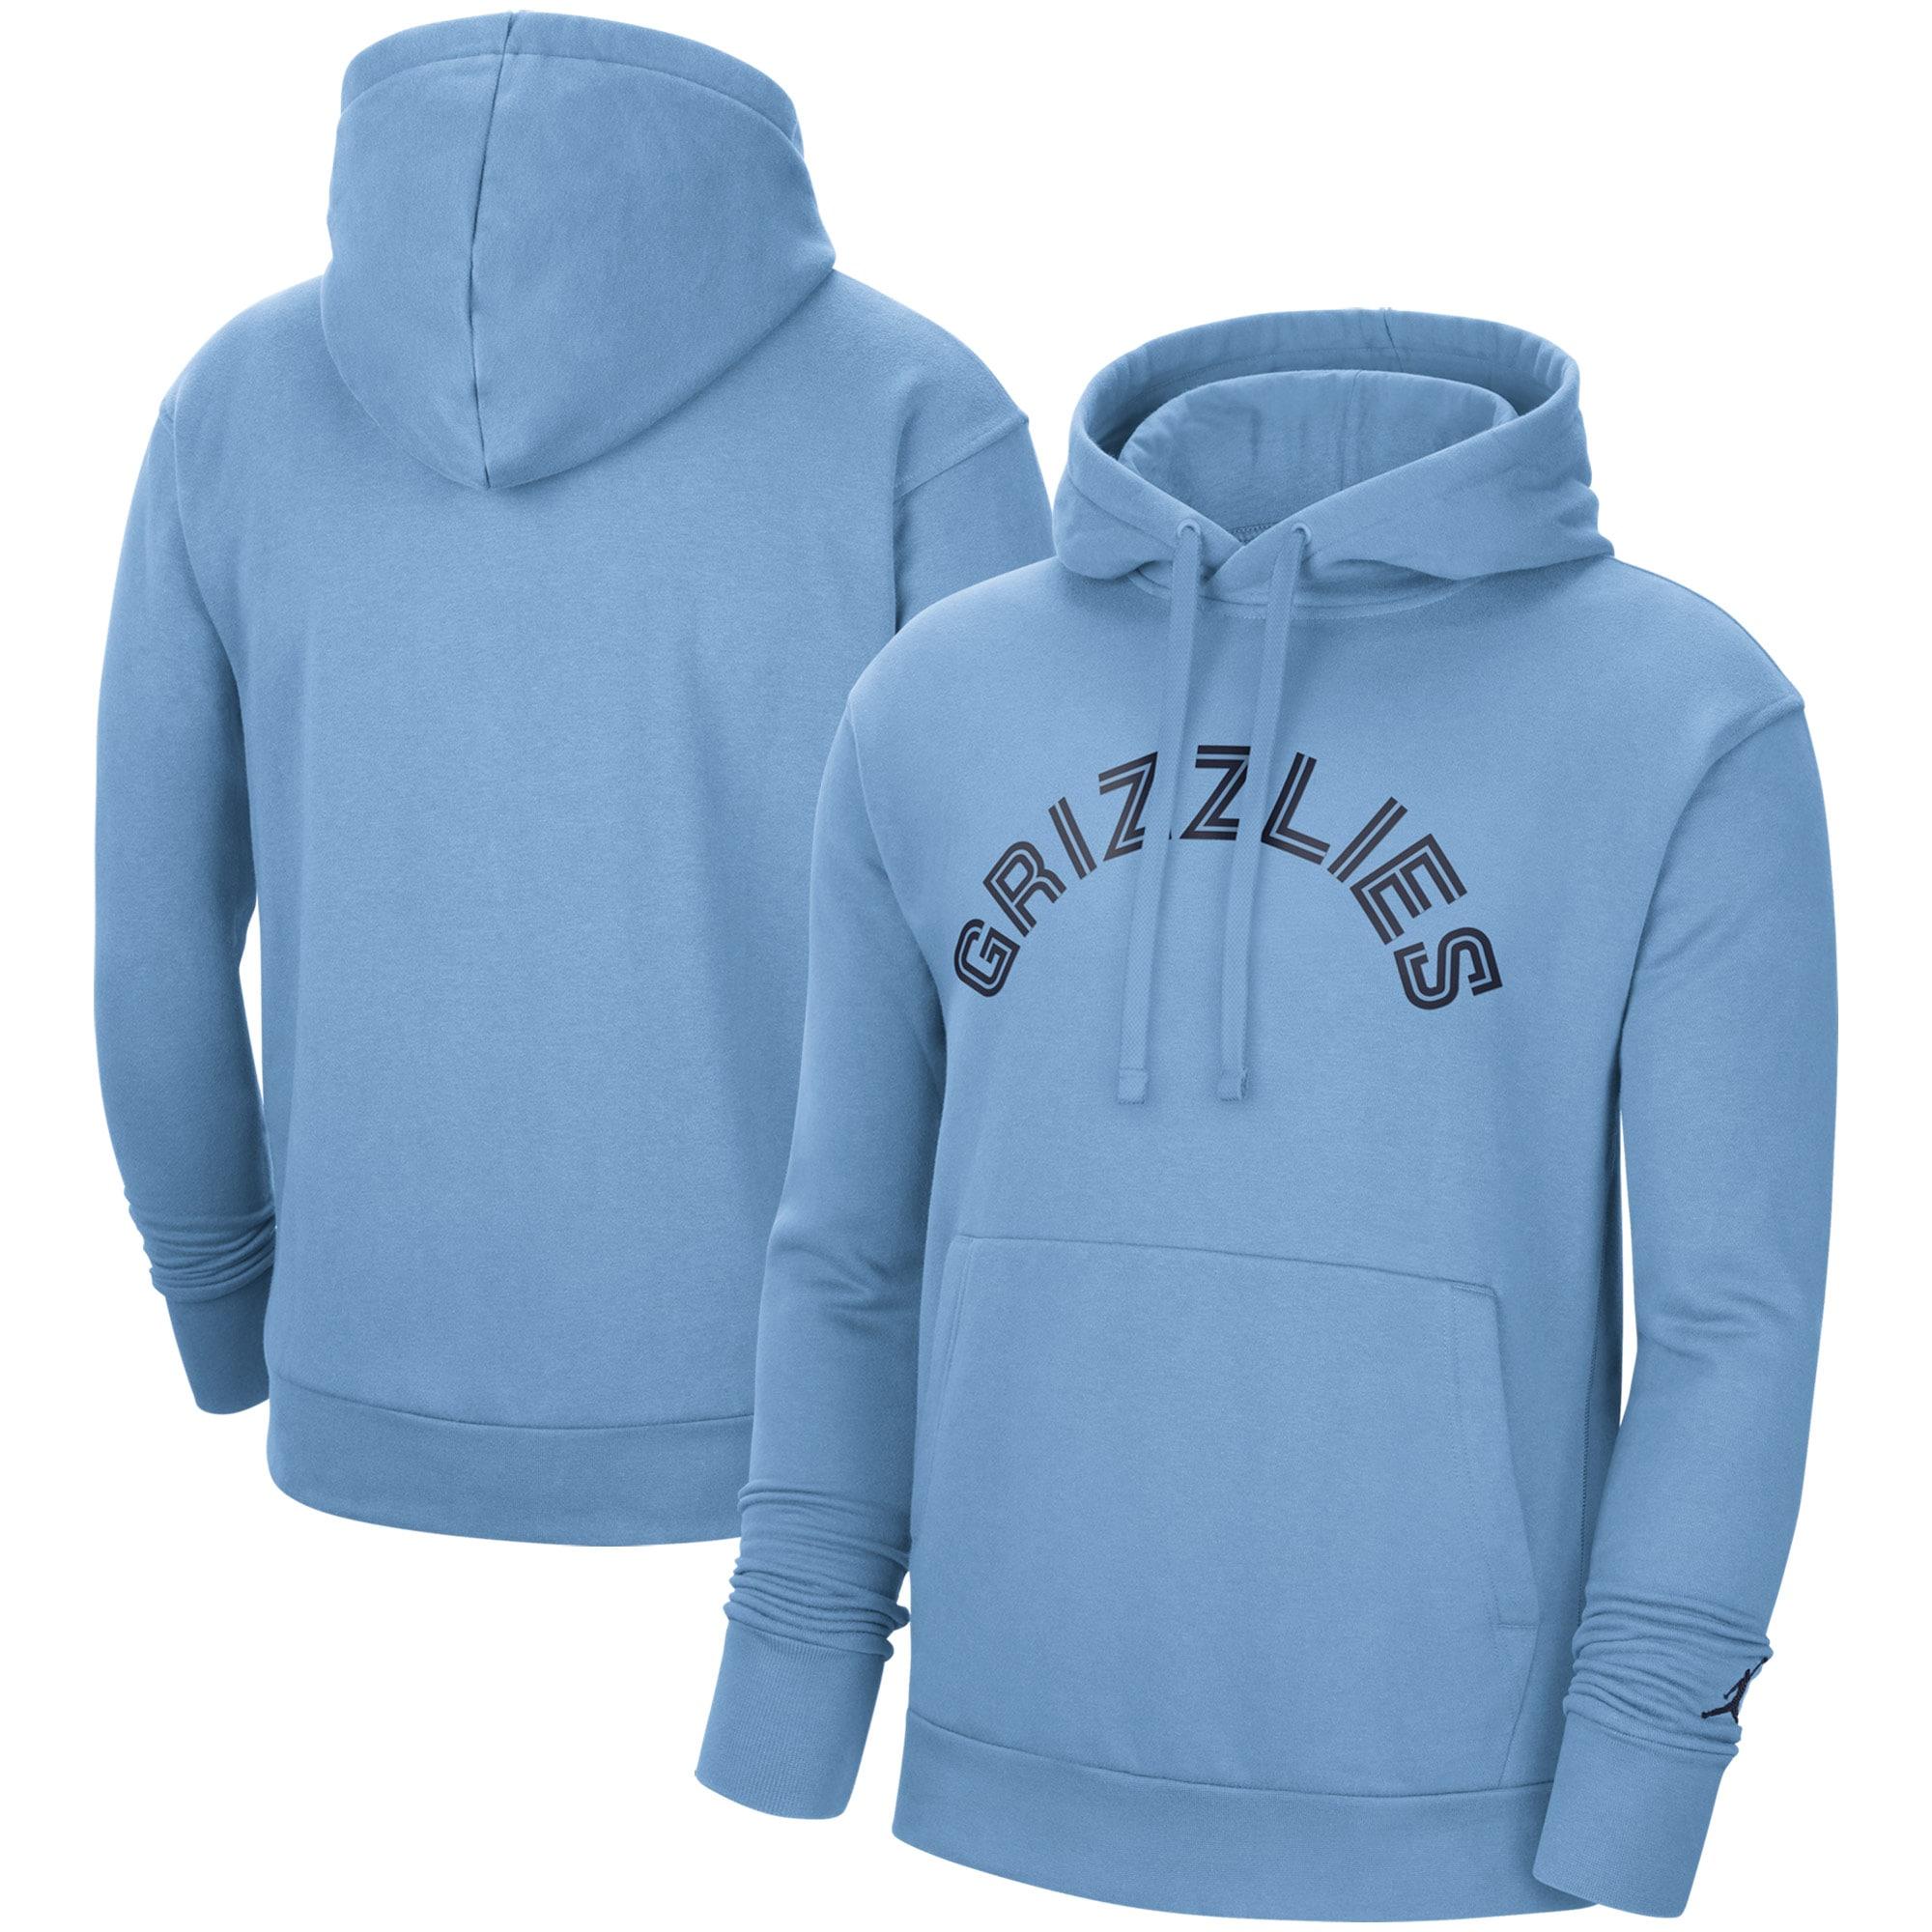 Memphis Grizzlies Jordan Brand Statement Edition Pullover Hoodie - Light Blue